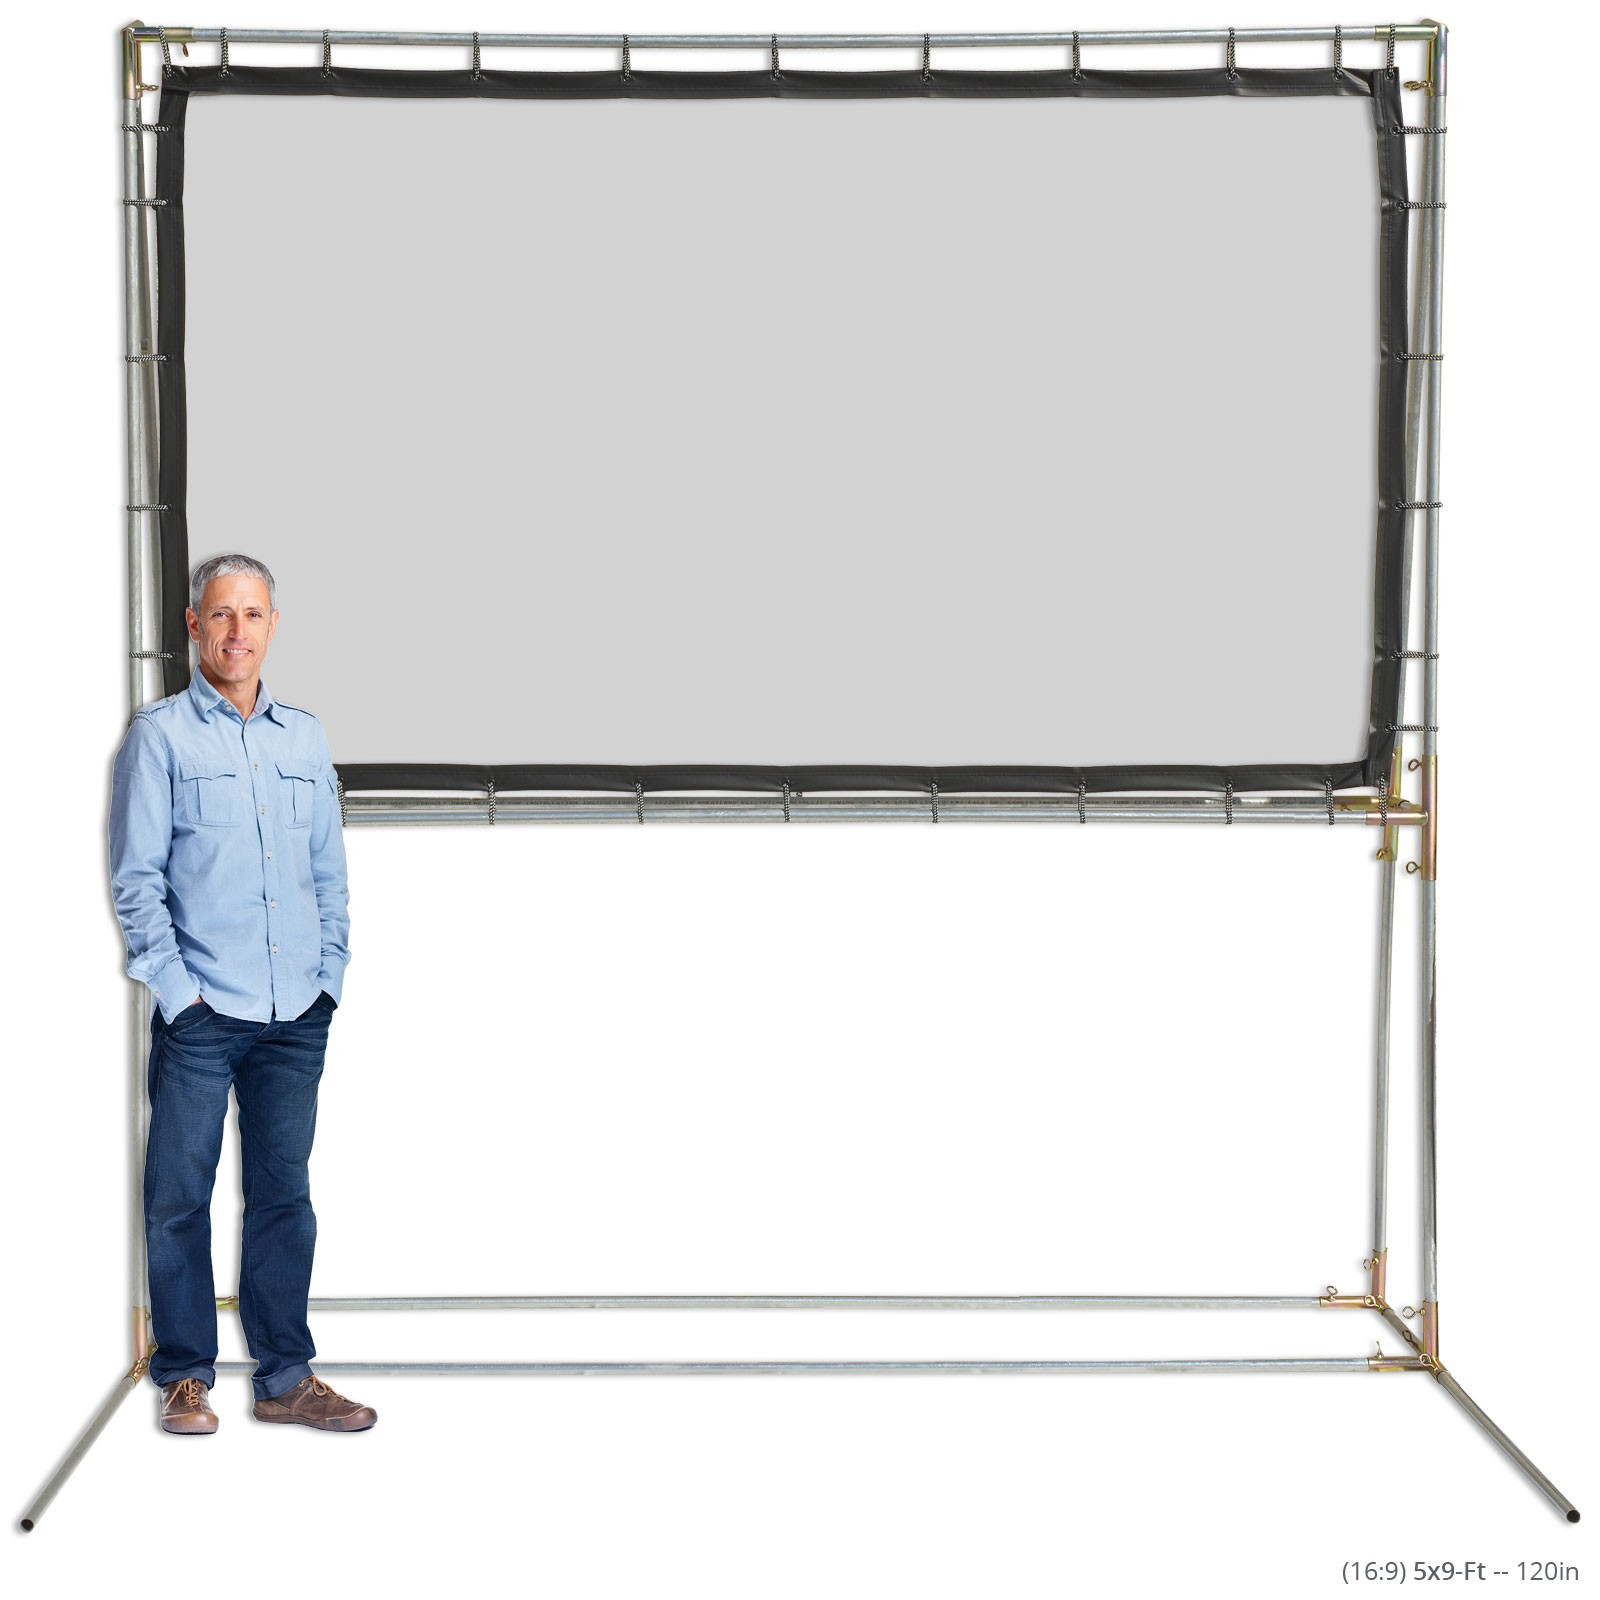 DIY Outdoor Movie Screen Material  Freestanding Movie Screen Kits Outdoor Projection Screens